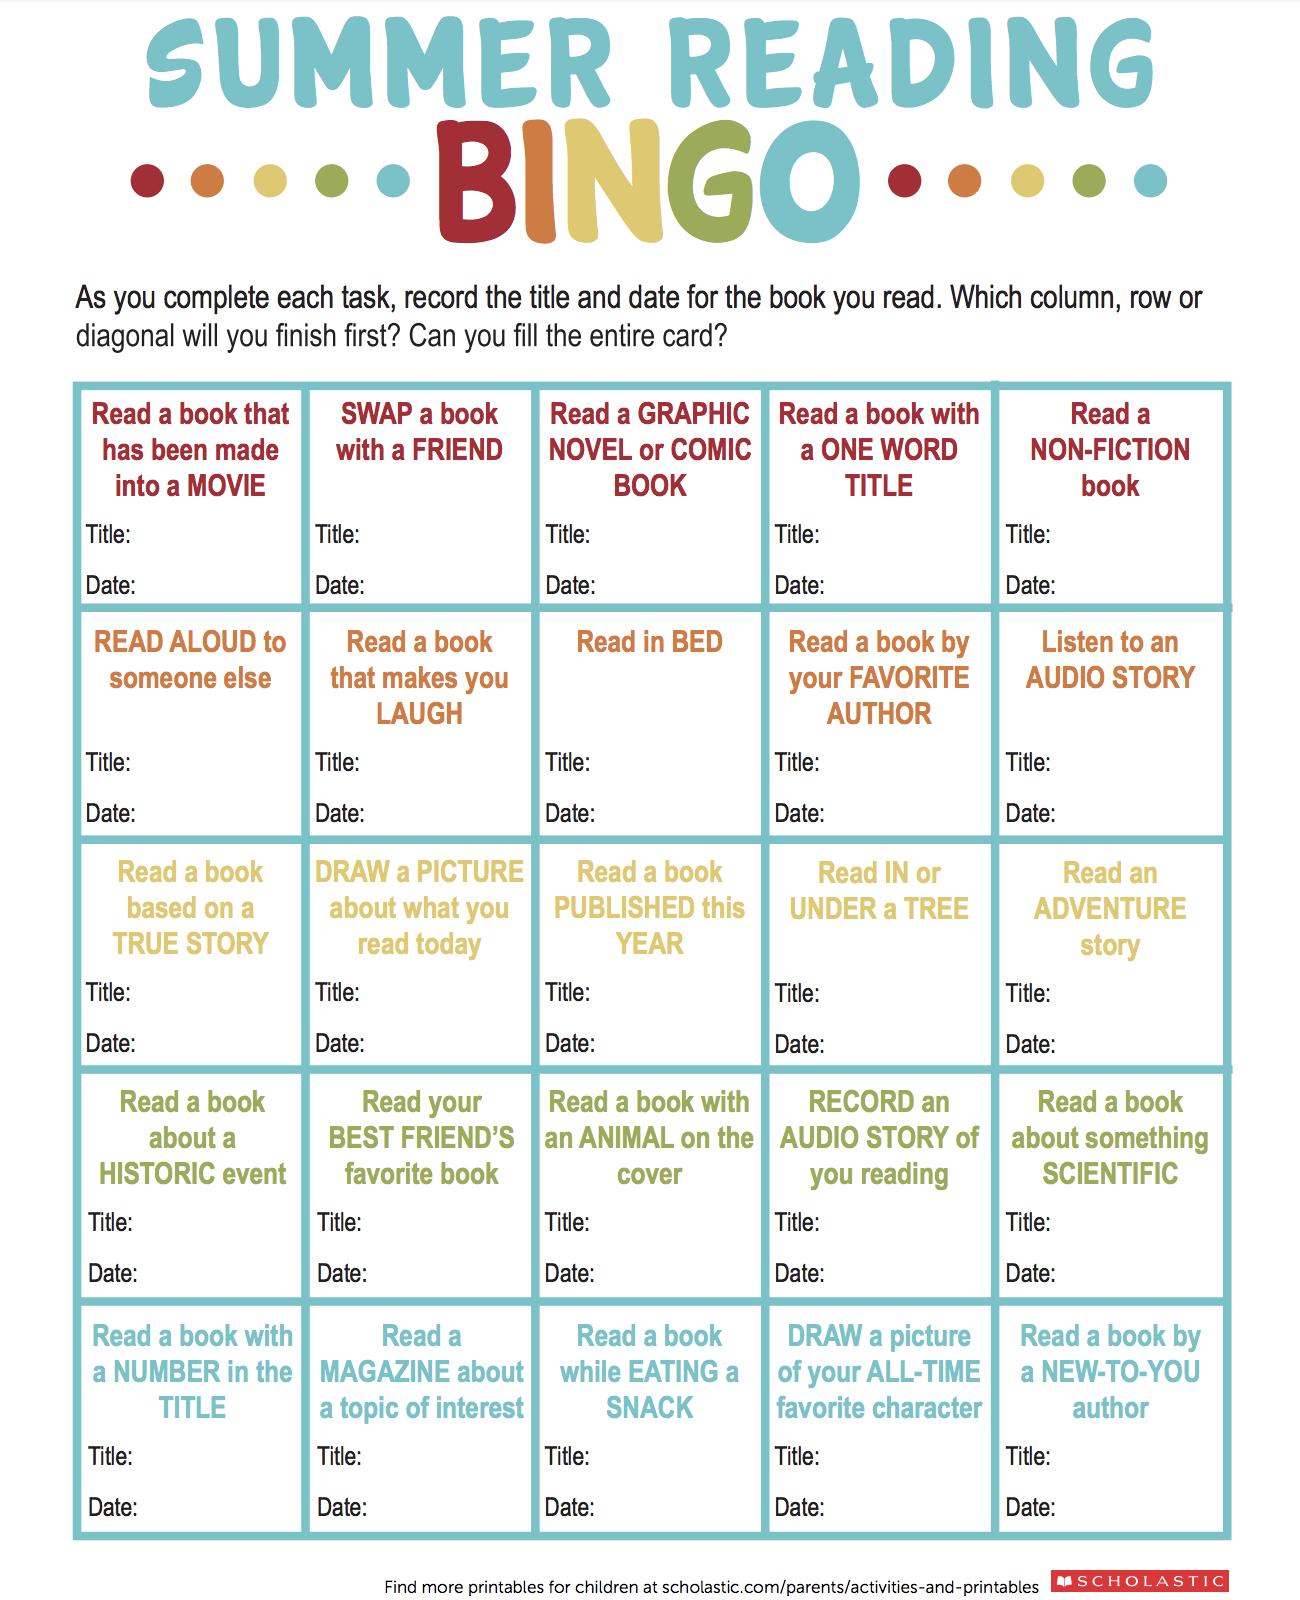 Summer Reading Bingo Printable | Printables: Ages 6-7